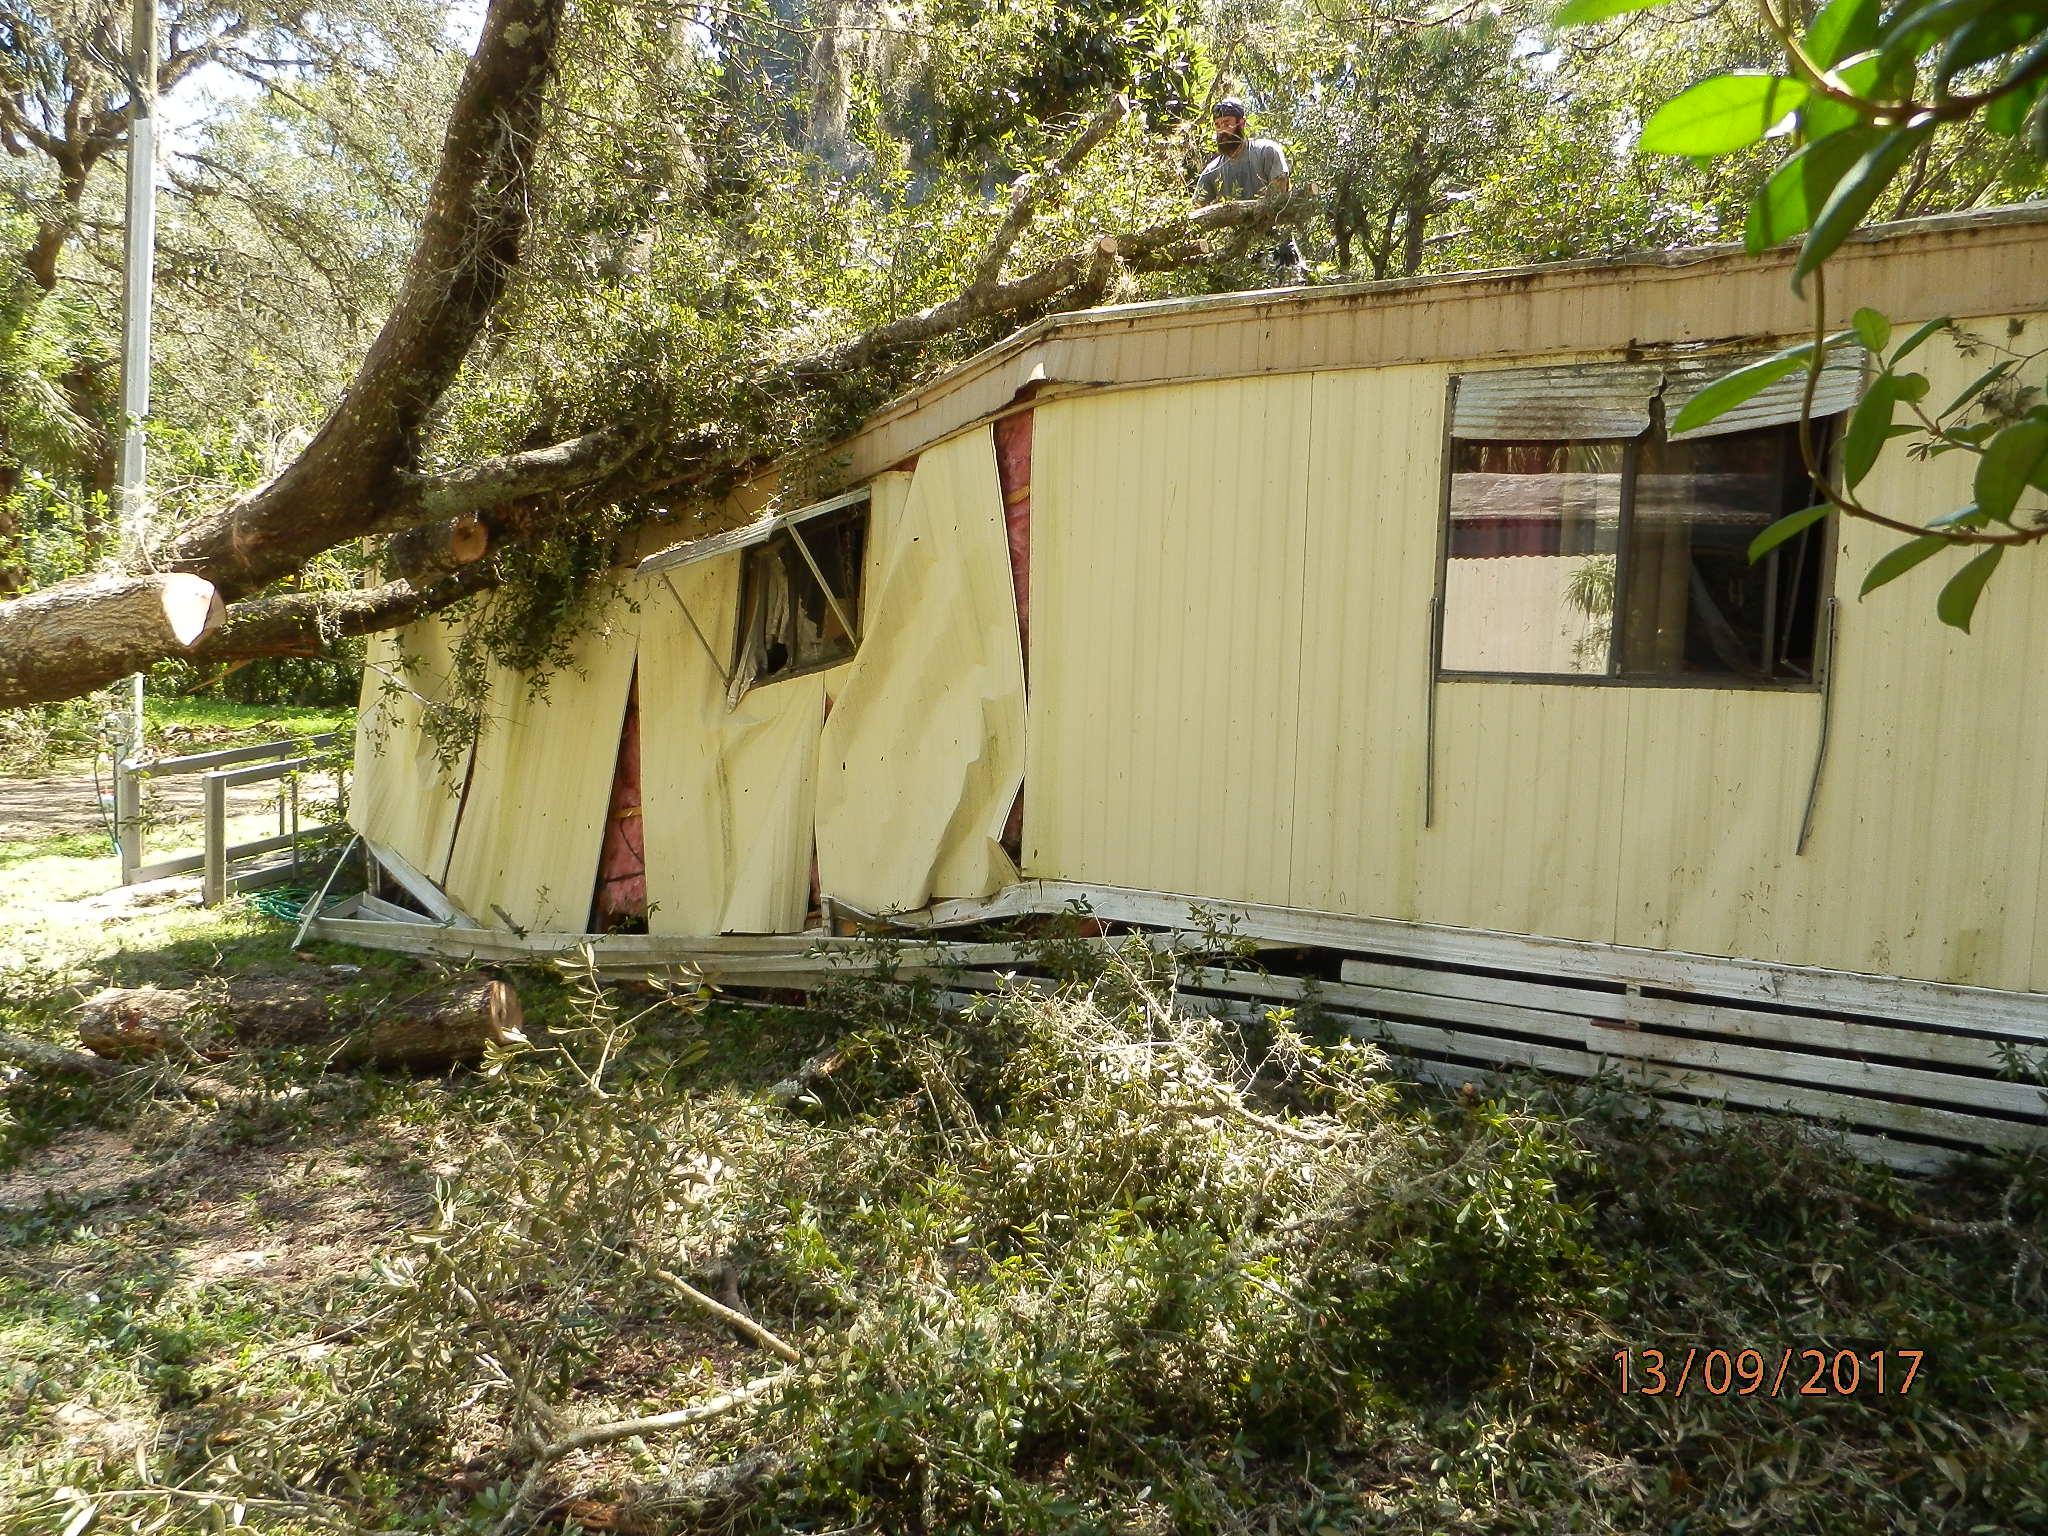 Suncoast Mobile Home Park Crystal River FL 34429